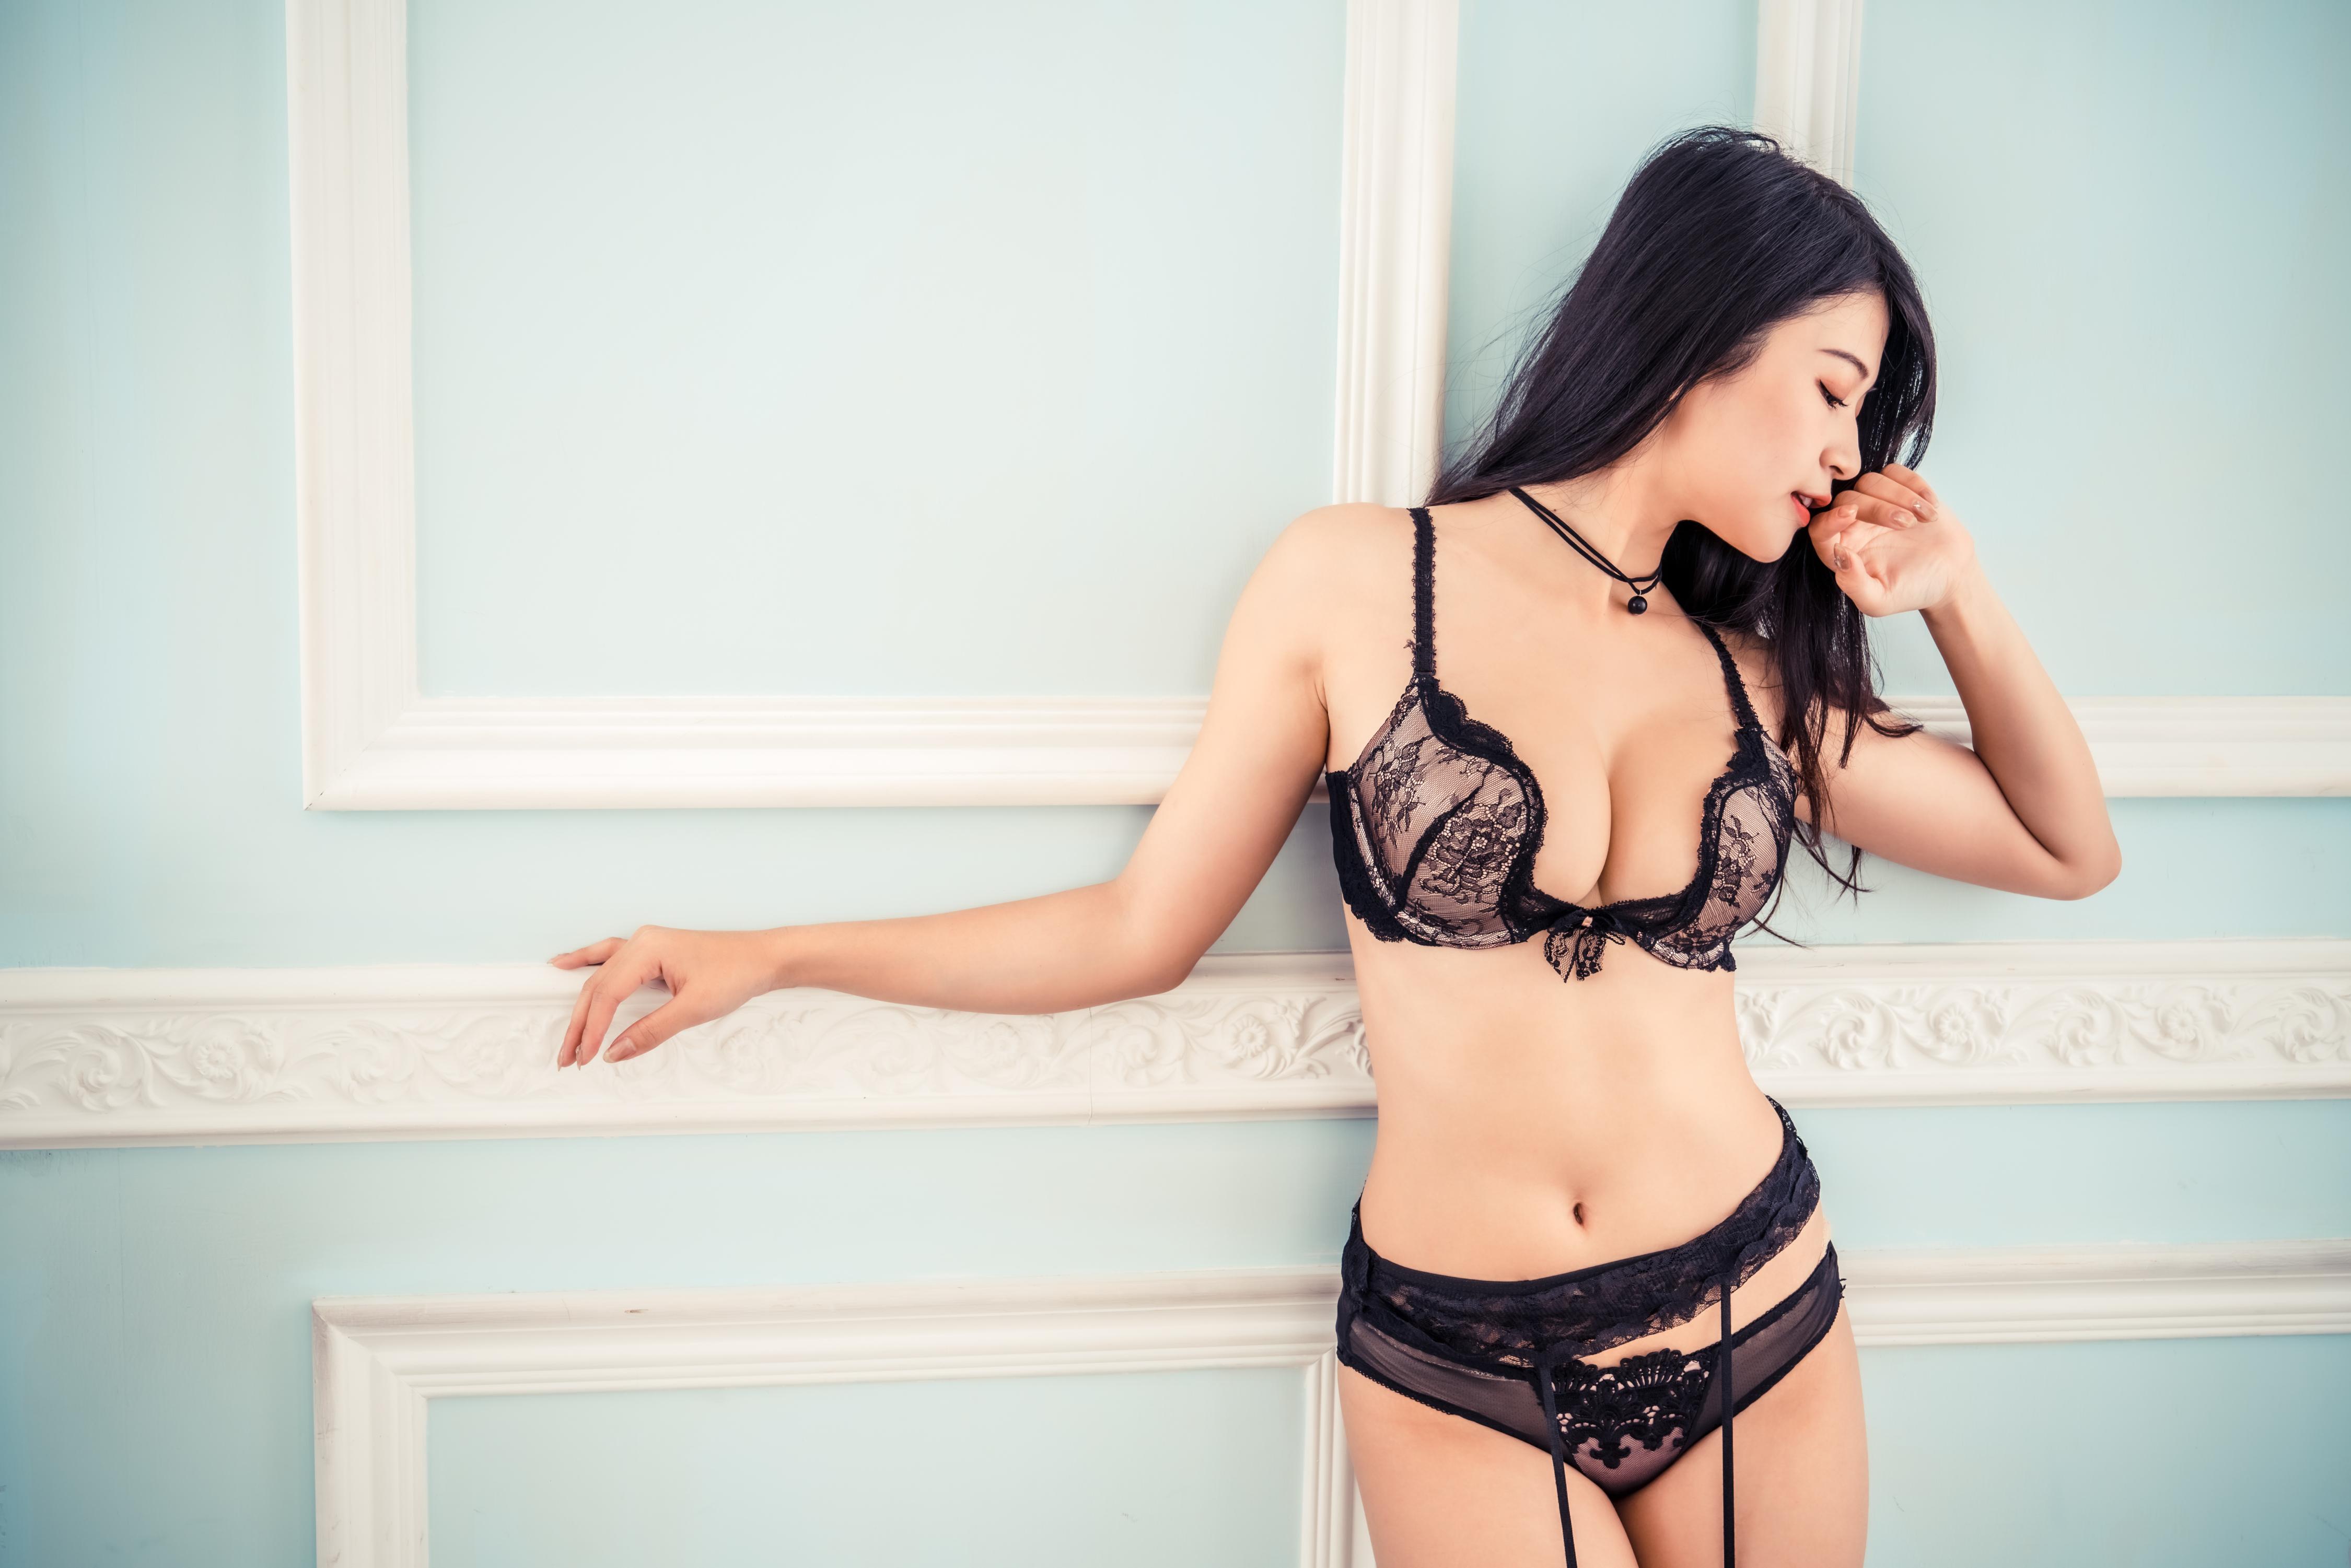 People 4500x3002 Asian women model brunette Lin Jiayi profile lingerie black lingerie bra garter belt panties belly necklace indoors women indoors Chinese